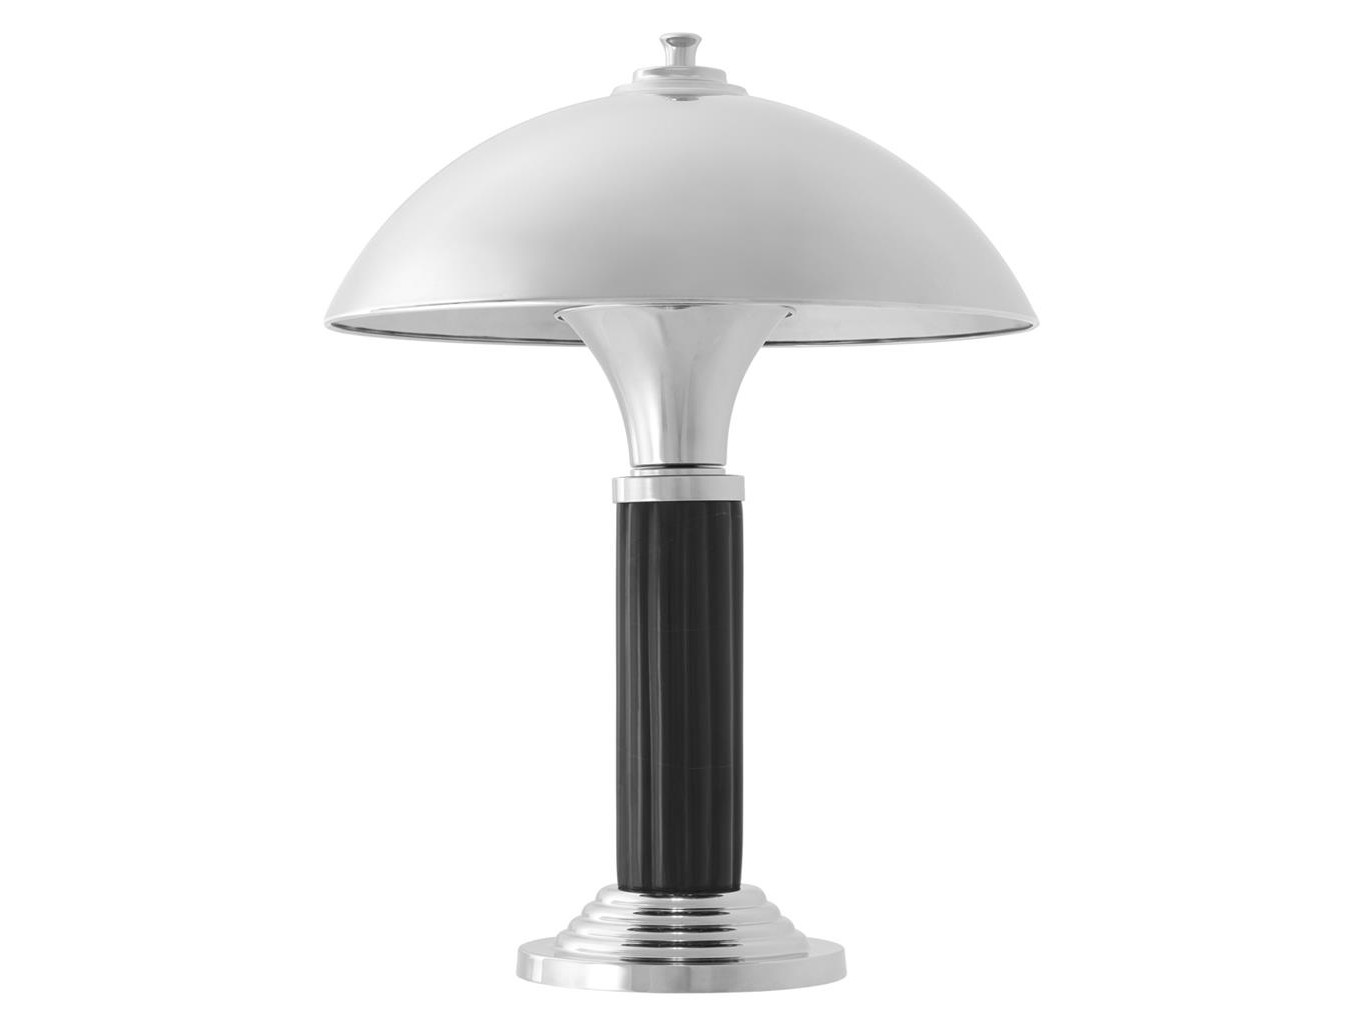 Настольная лампа San Remo SДекоративные лампы<br>&amp;lt;div&amp;gt;&amp;lt;div&amp;gt;Материал: мрамор, металл&amp;lt;/div&amp;gt;&amp;lt;div&amp;gt;&amp;lt;br&amp;gt;&amp;lt;/div&amp;gt;&amp;lt;div&amp;gt;Вид цоколя: E27&amp;lt;/div&amp;gt;&amp;lt;div&amp;gt;Мощность:&amp;amp;nbsp; 40W&amp;lt;/div&amp;gt;&amp;lt;div&amp;gt;Количество ламп: 1 (нет в комплекте)&amp;lt;/div&amp;gt;&amp;lt;/div&amp;gt;<br><br>Material: Мрамор<br>Ширина см: 36.0<br>Высота см: 48.0<br>Глубина см: 36.0